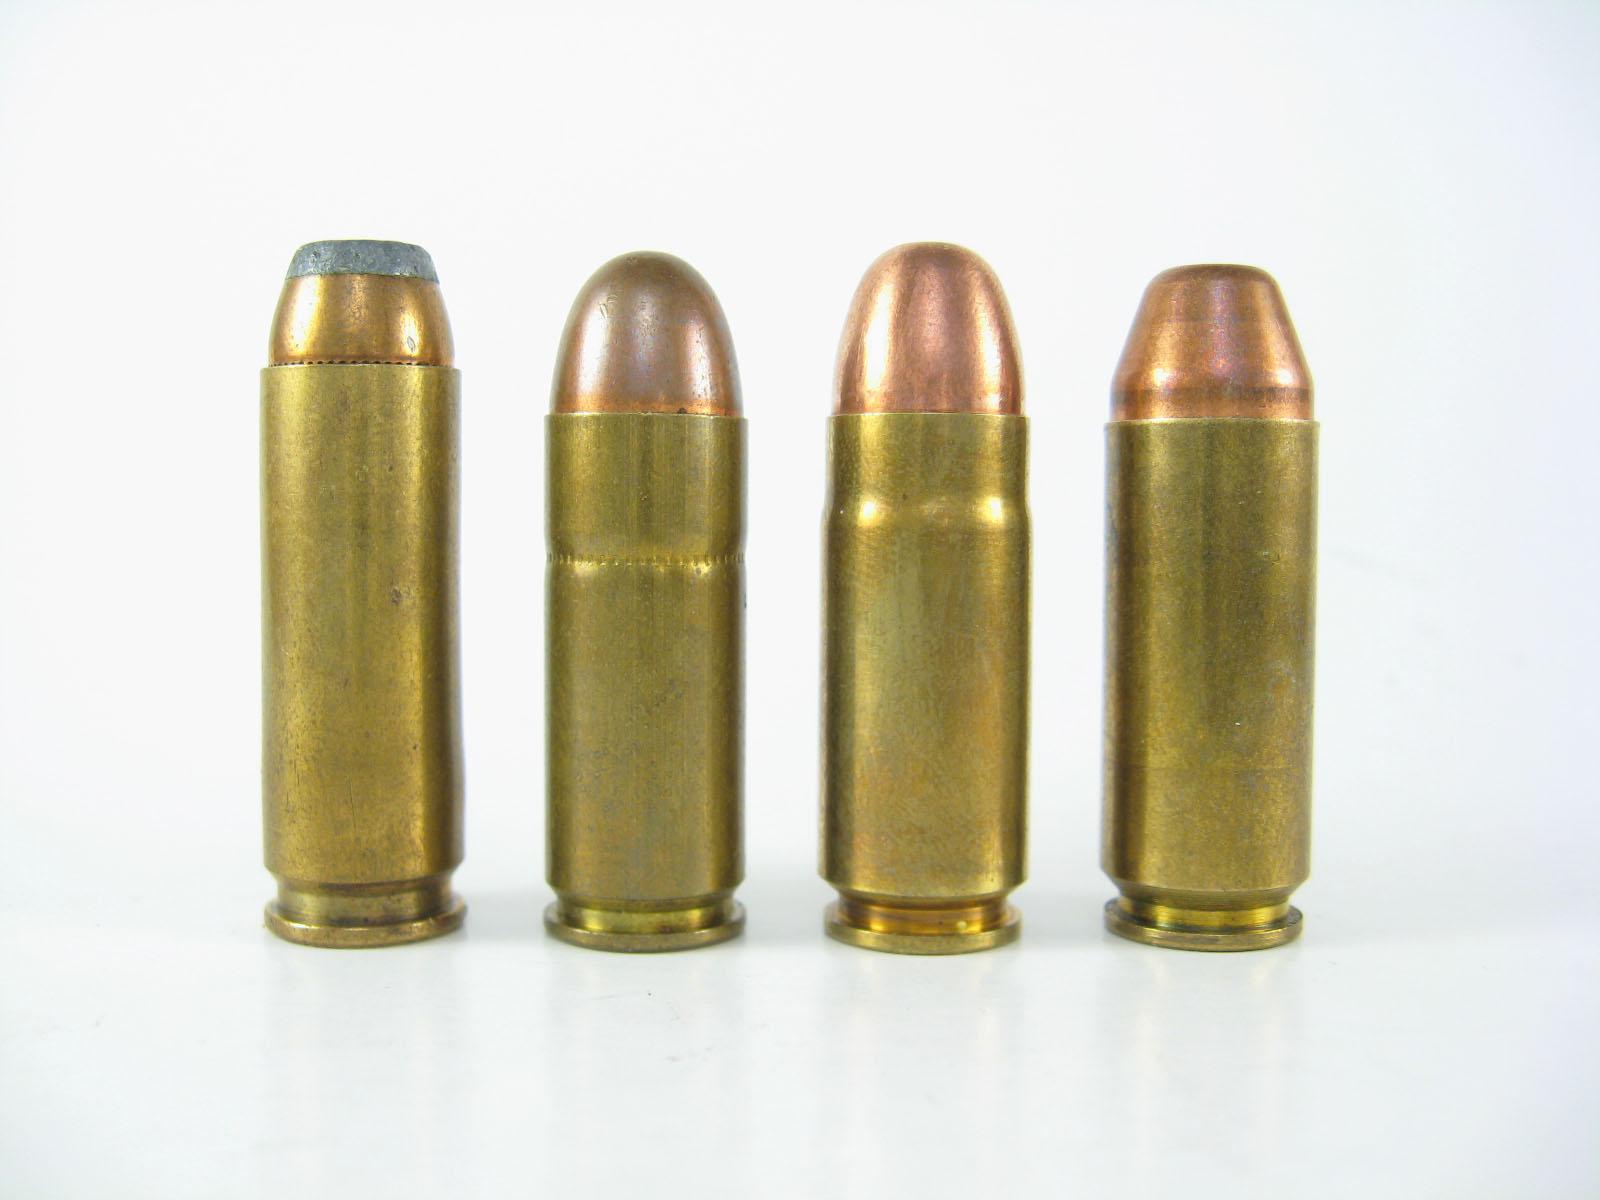 45 Winchester Magnum - Wikipedia